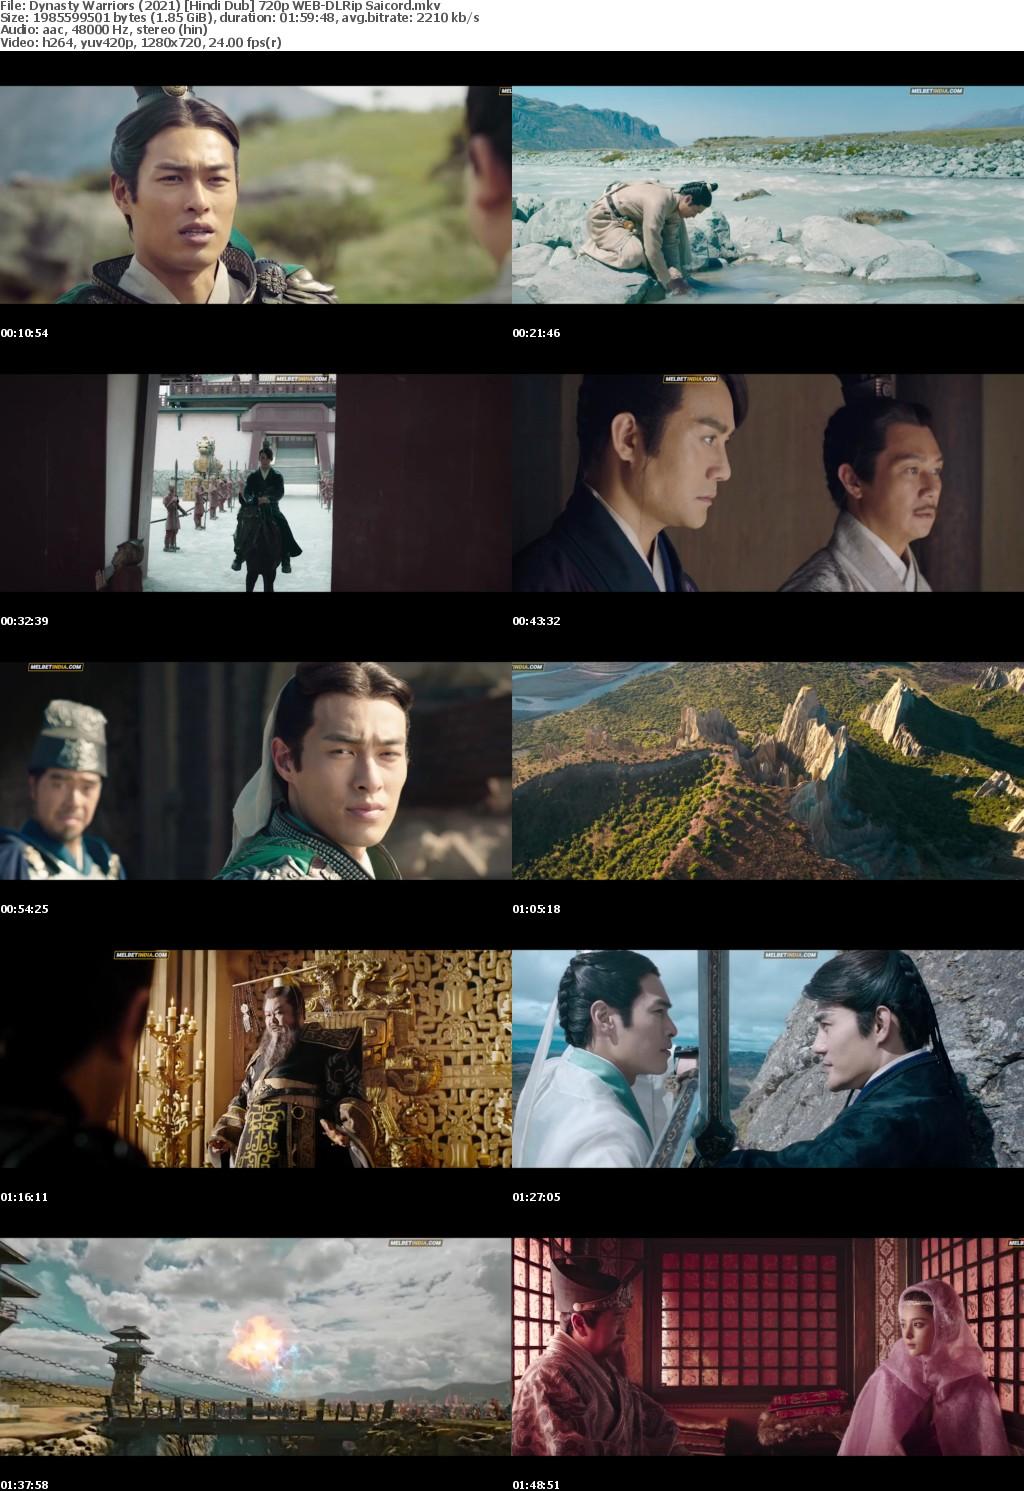 Dynasty Warriors (2021) Hindi Dub 720p WEB-DLRip Saicord